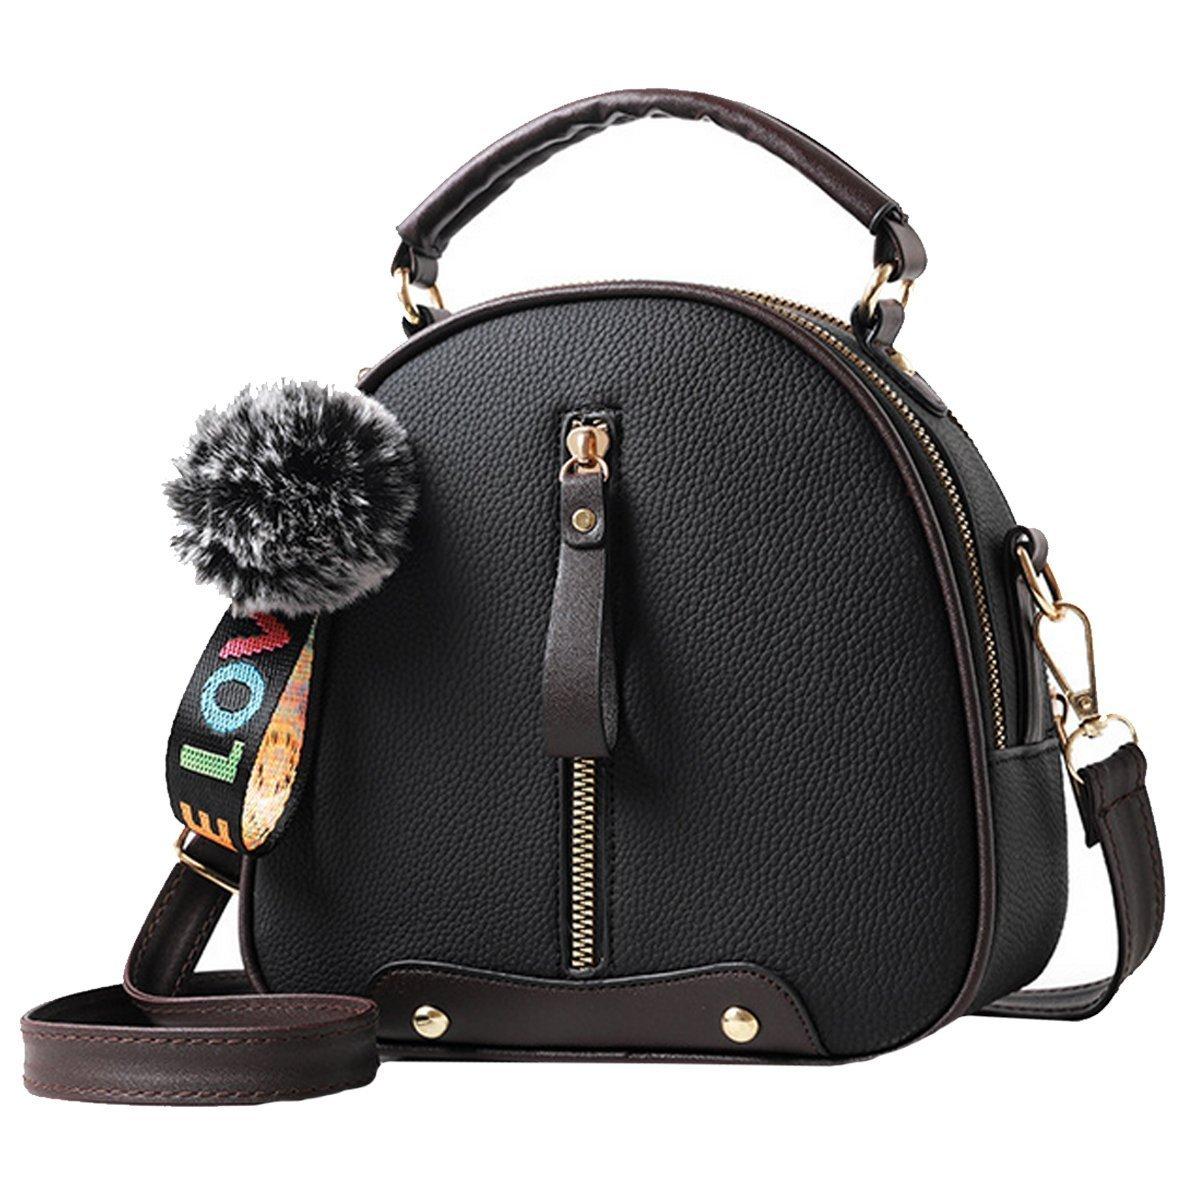 ZLMBAGUS Women Vintage Sweet Fashion Tote Top Handle Satchel Crossbody Handbags PU Leather Fur Ball Clutch Purse Shoulder Bag Black